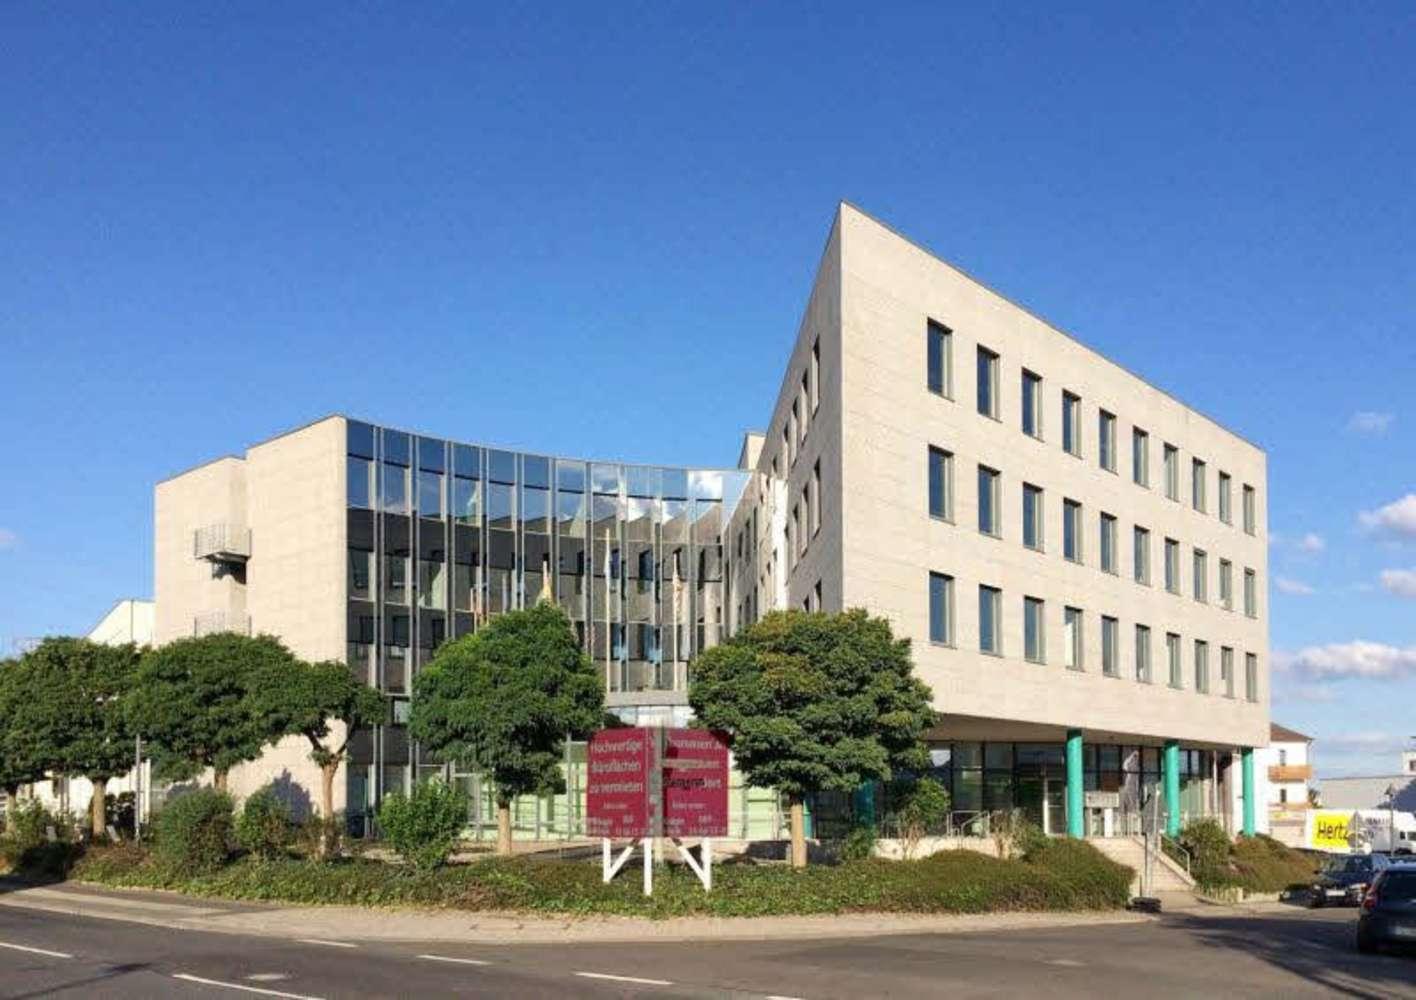 Büros Oberursel (taunus), 61440 - Büro - Oberursel (Taunus), Stierstadt - F1529 - 9419207